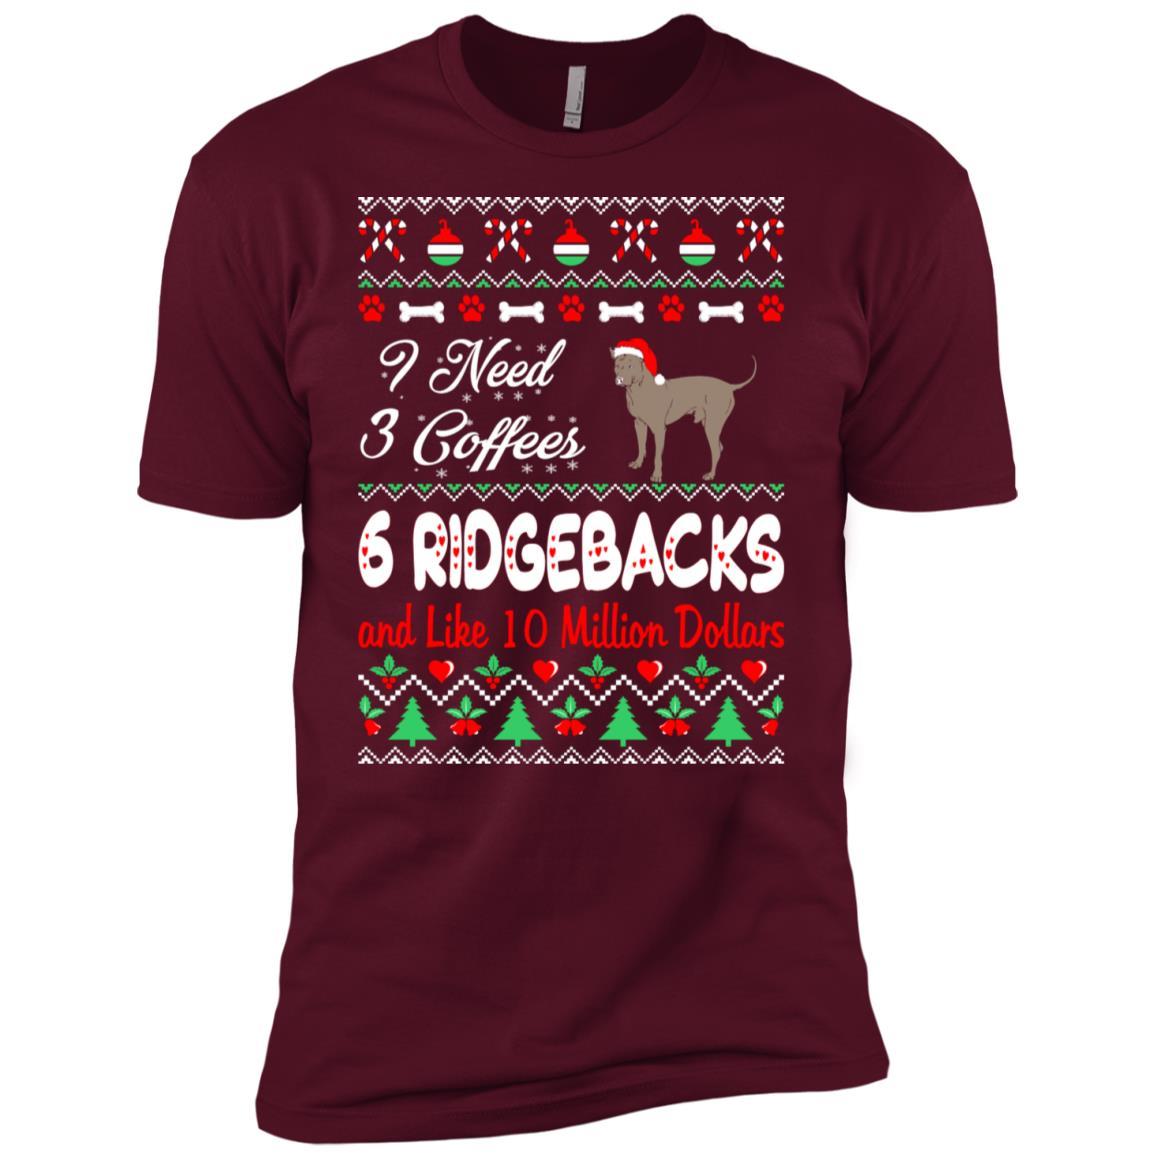 Need 3 Coffees 6 Ridgebacks Christmas Ugly Sweater Men Short Sleeve T-Shirt